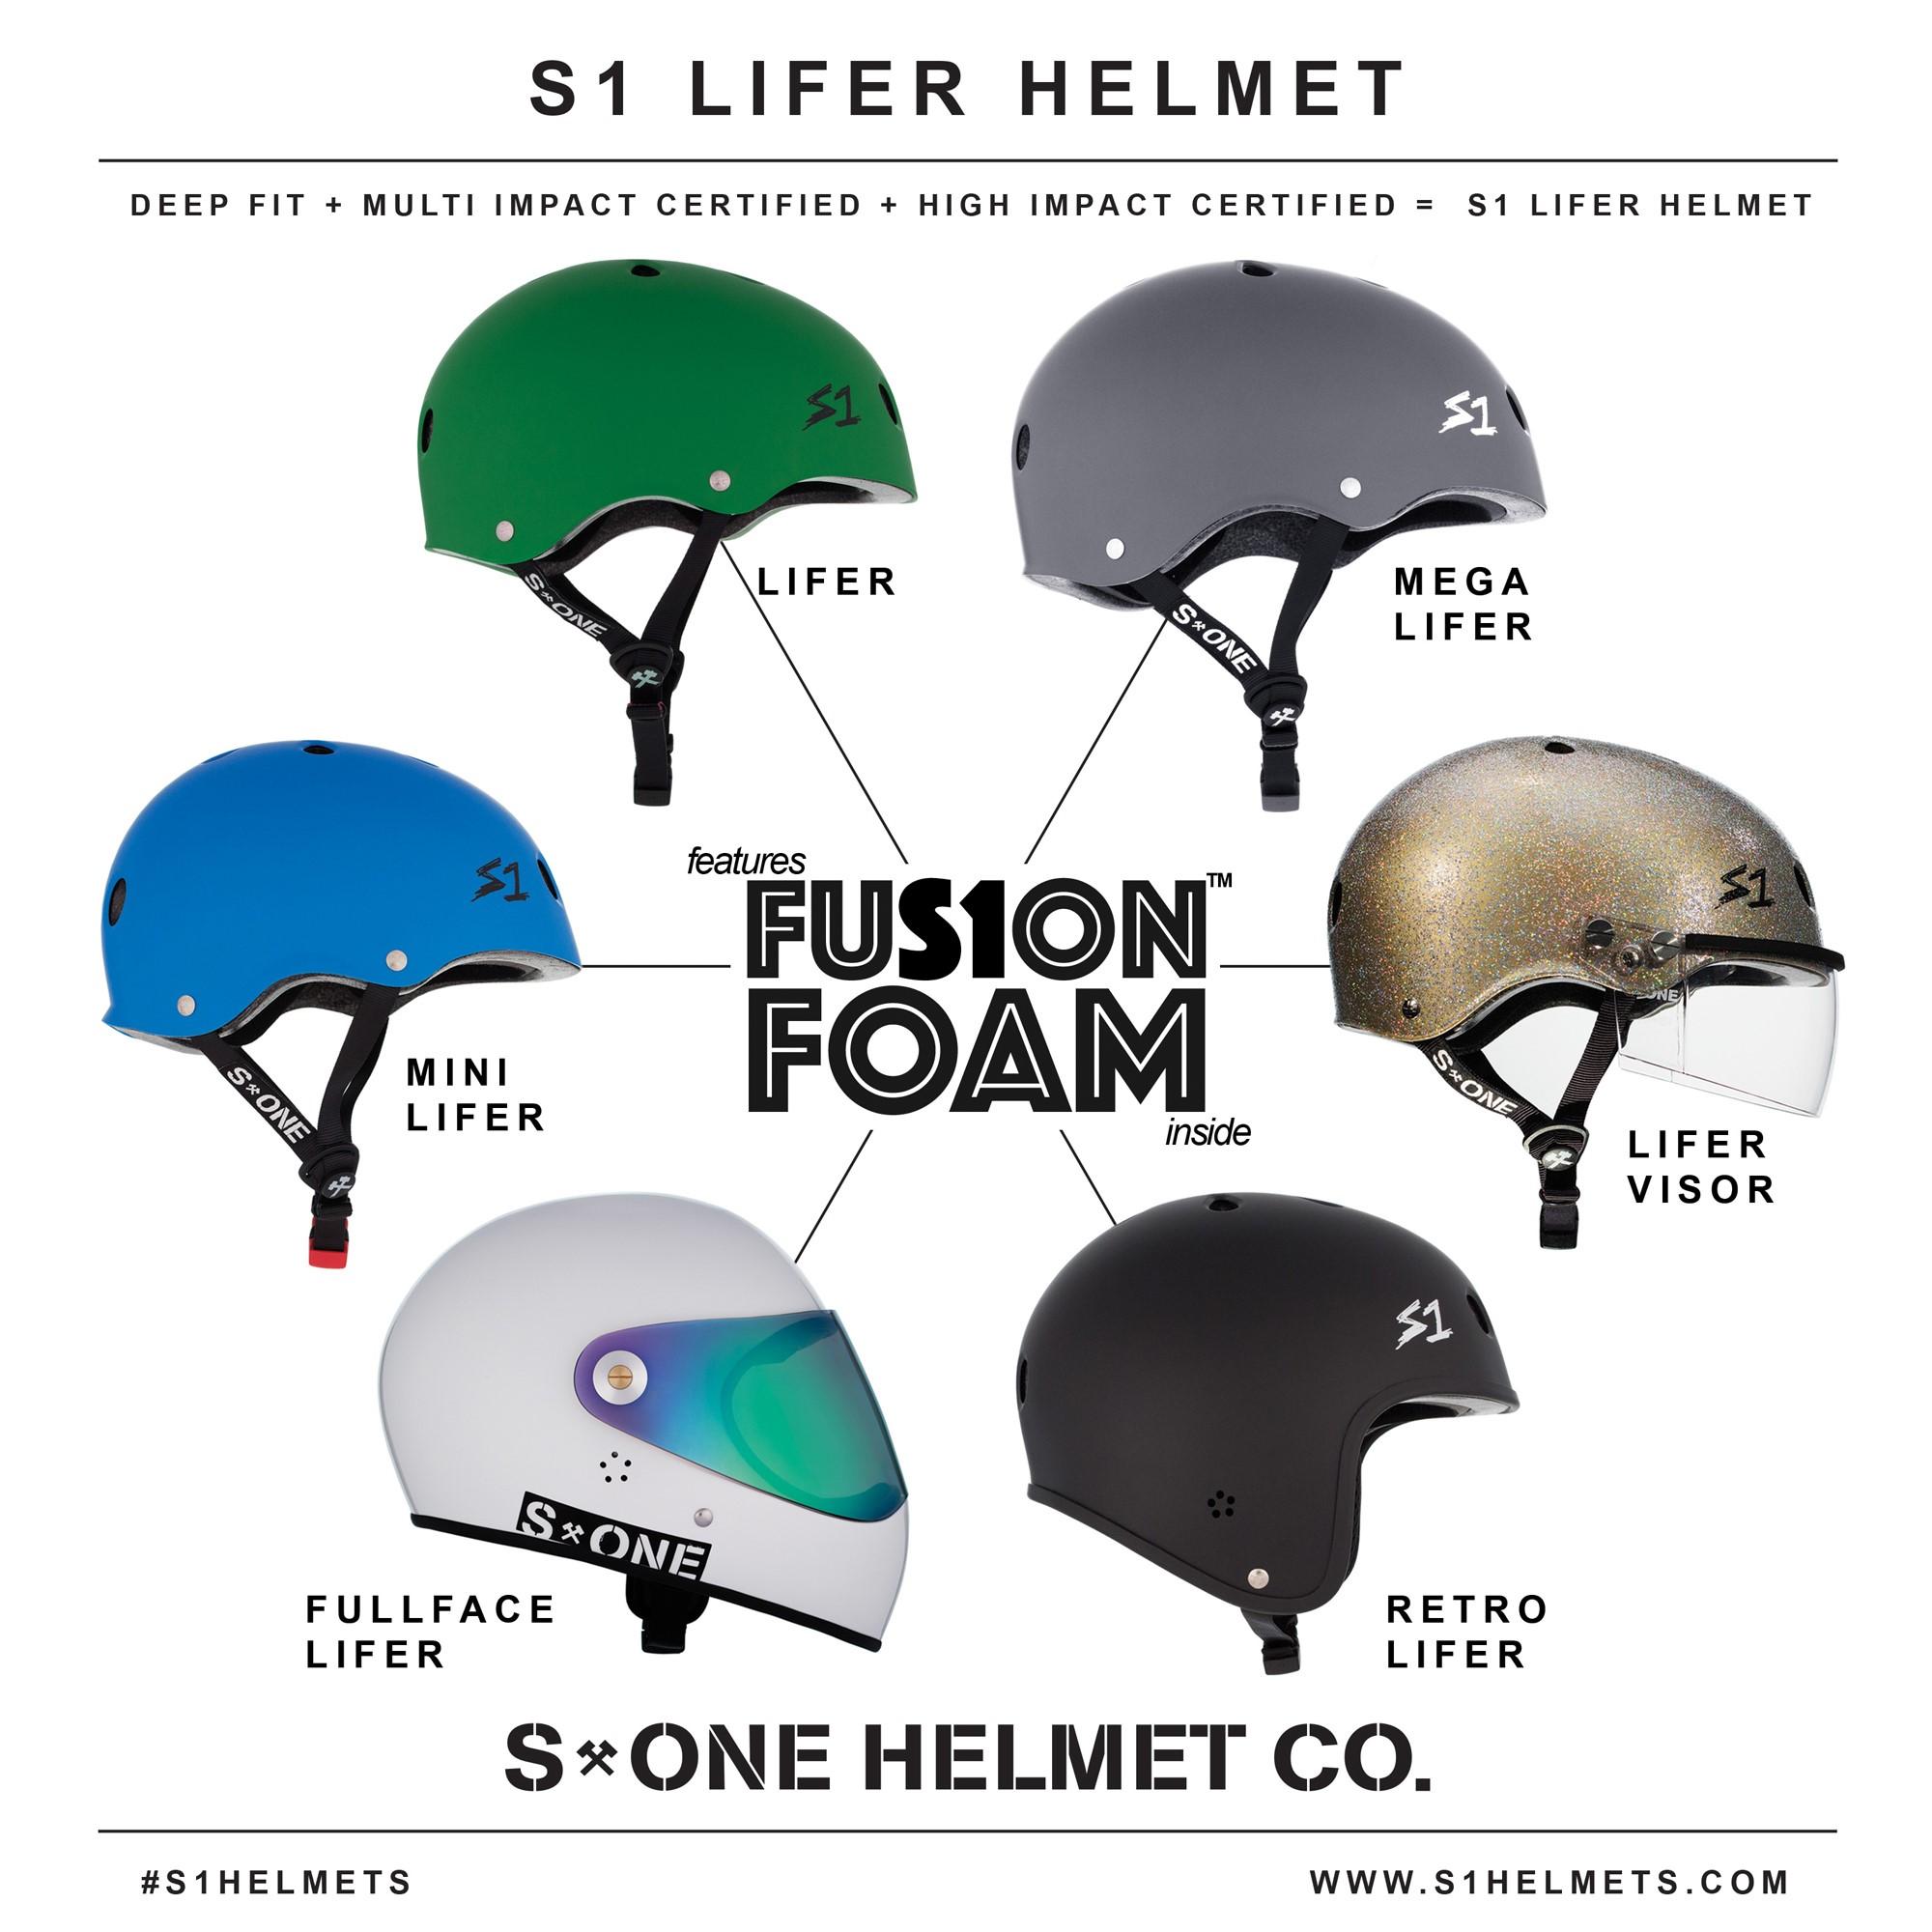 s1-helmet-co-product-over-view.jpg